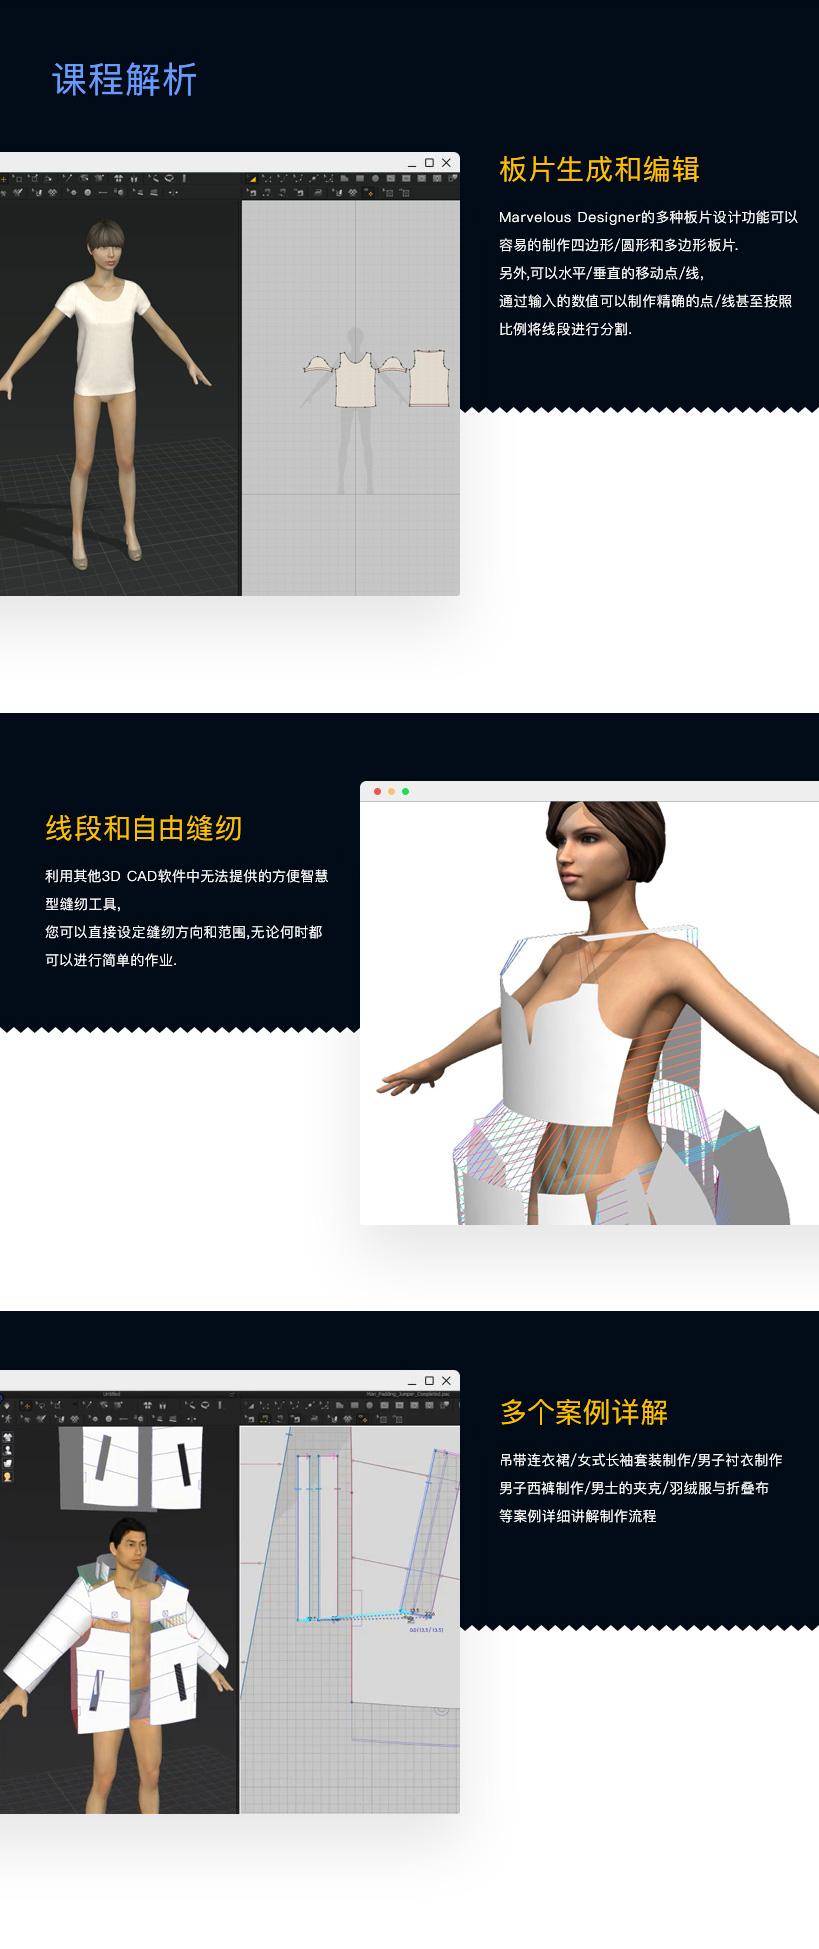 Marvelous Designer 6服装设计基础案例教程